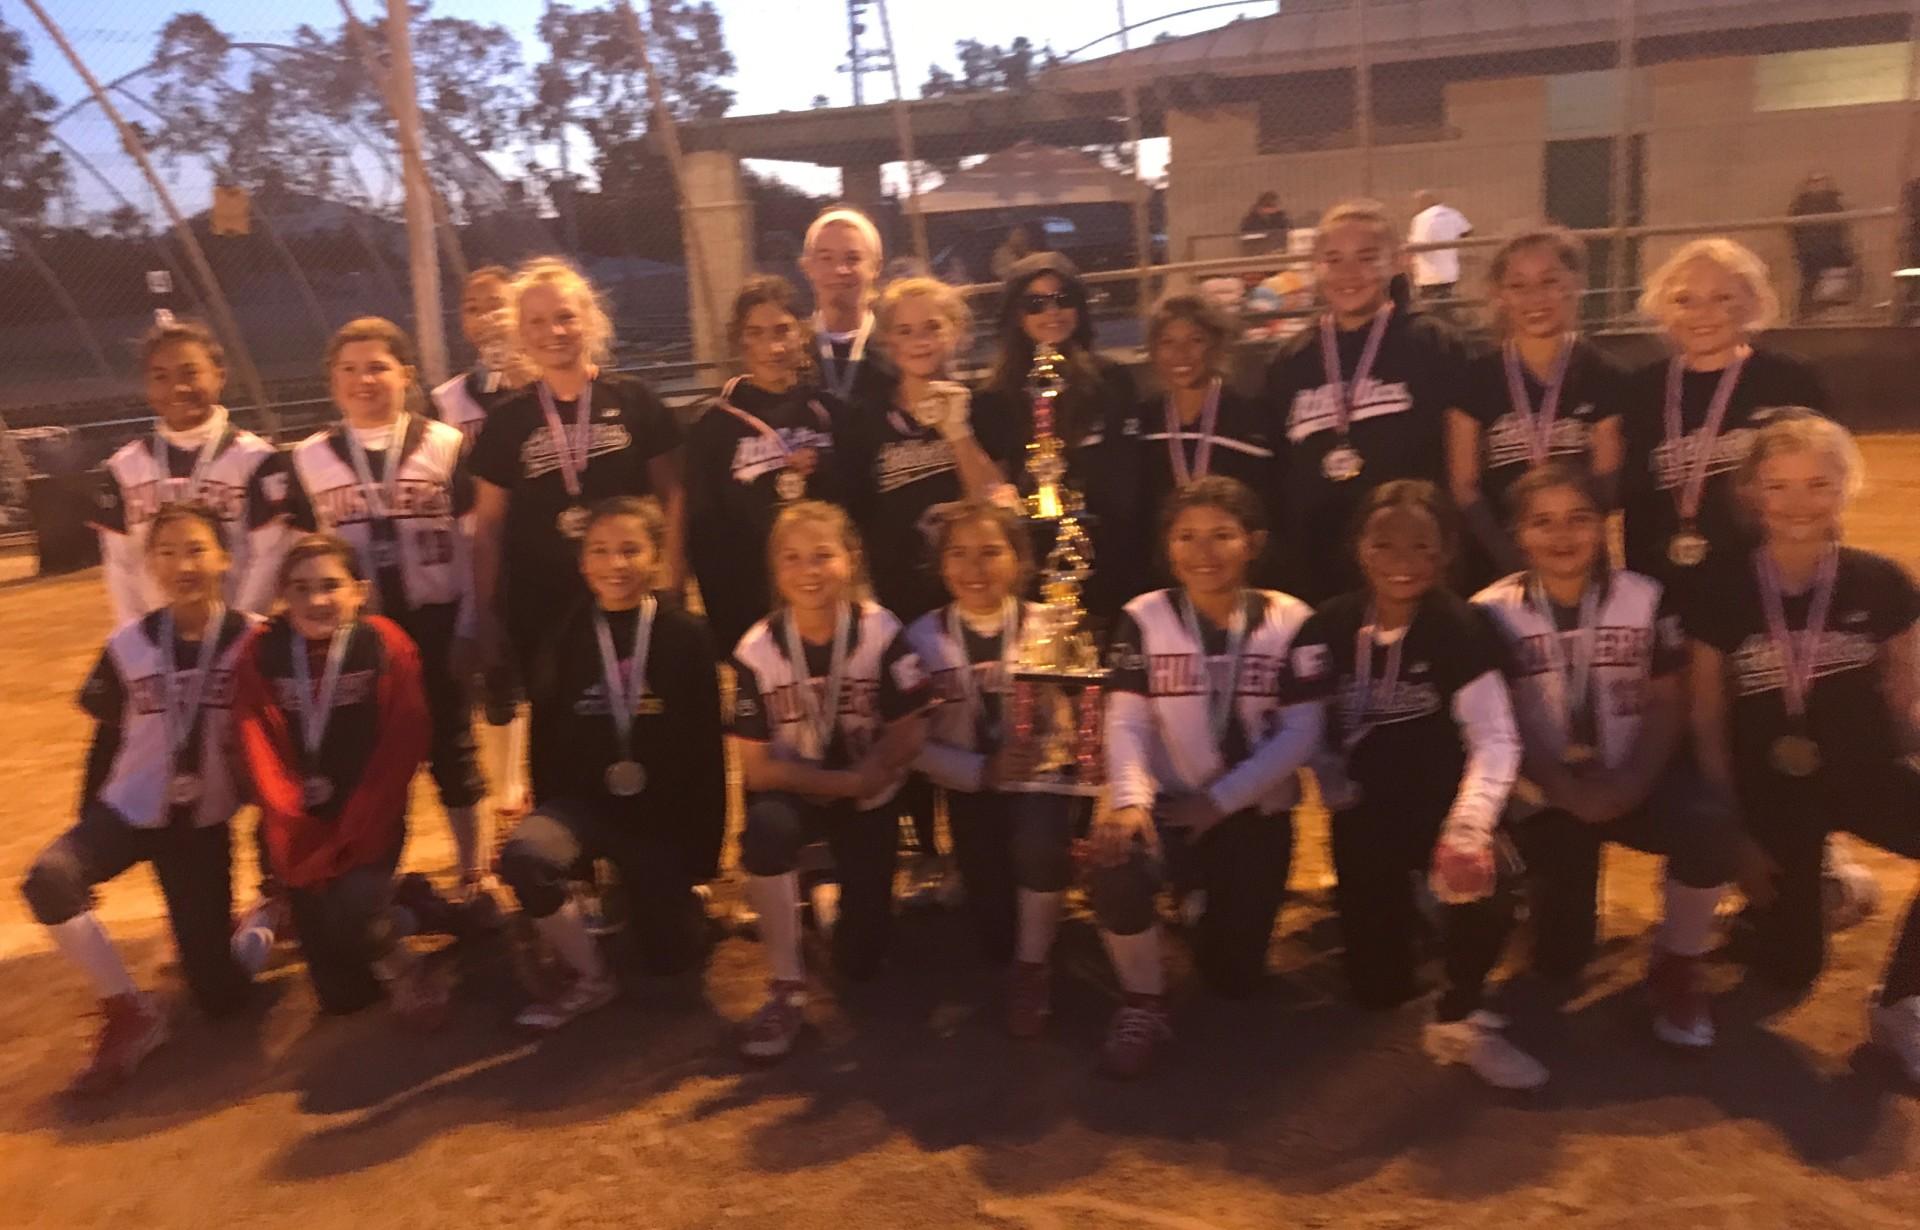 10u -  So Cal Athletics - Medina/Kingery and Lakewood Hustlers